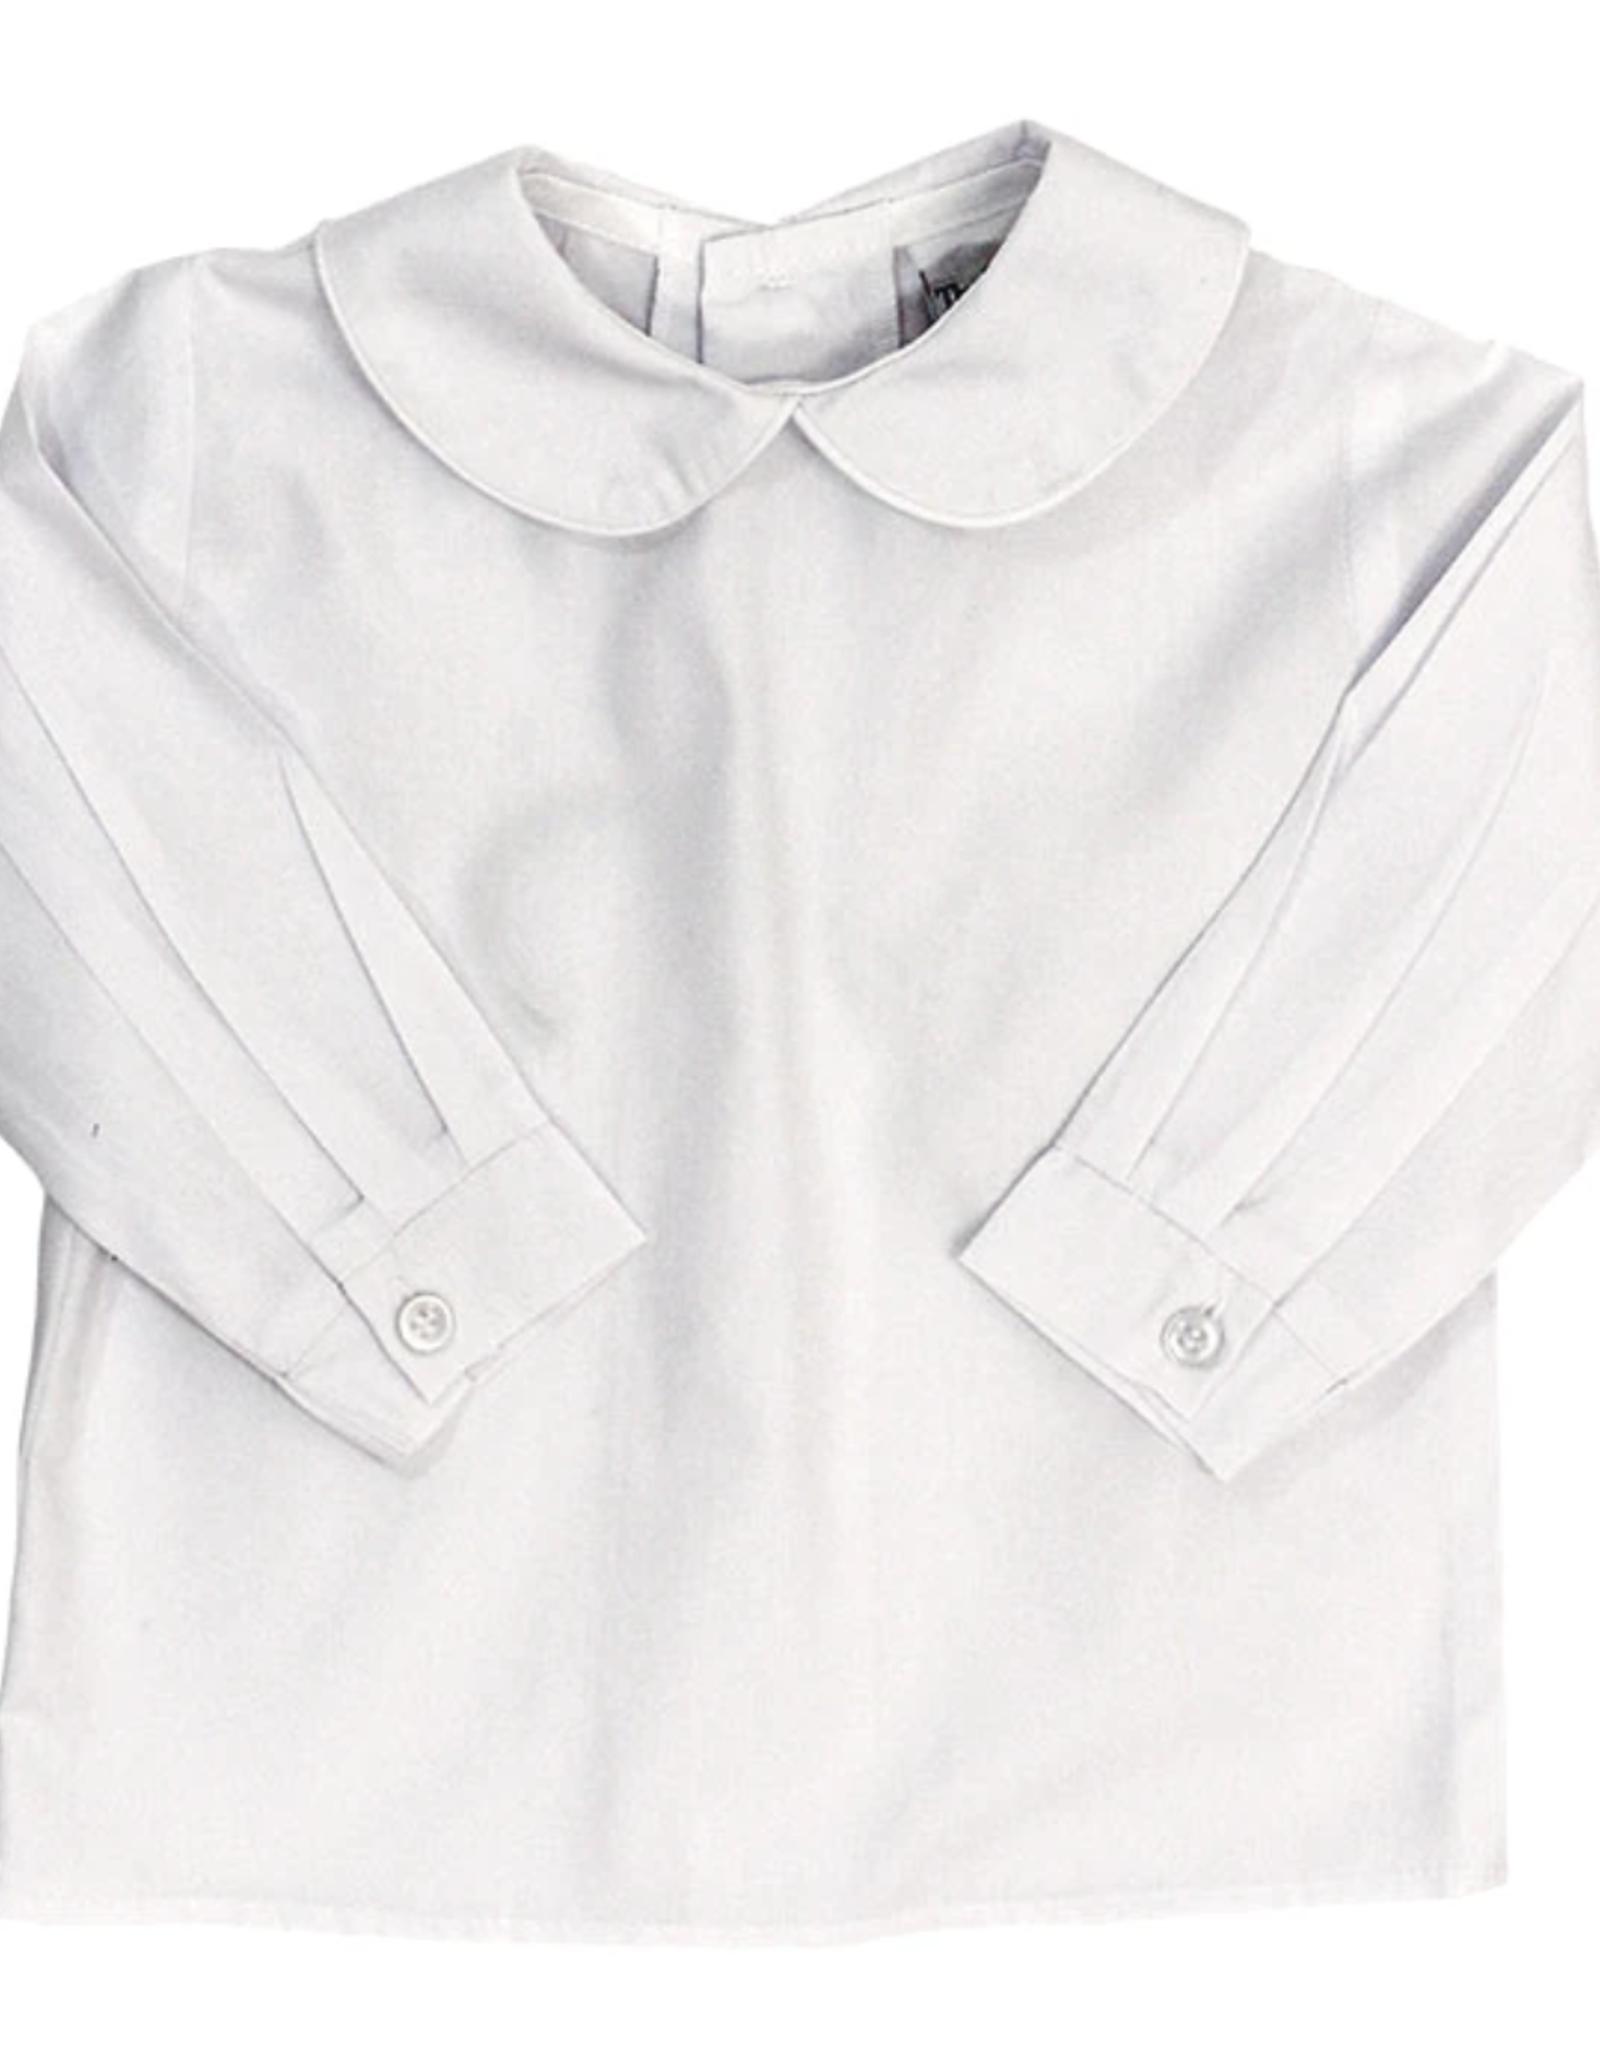 The Bailey Boys White Boys Long Sleeve Shirt Button Back